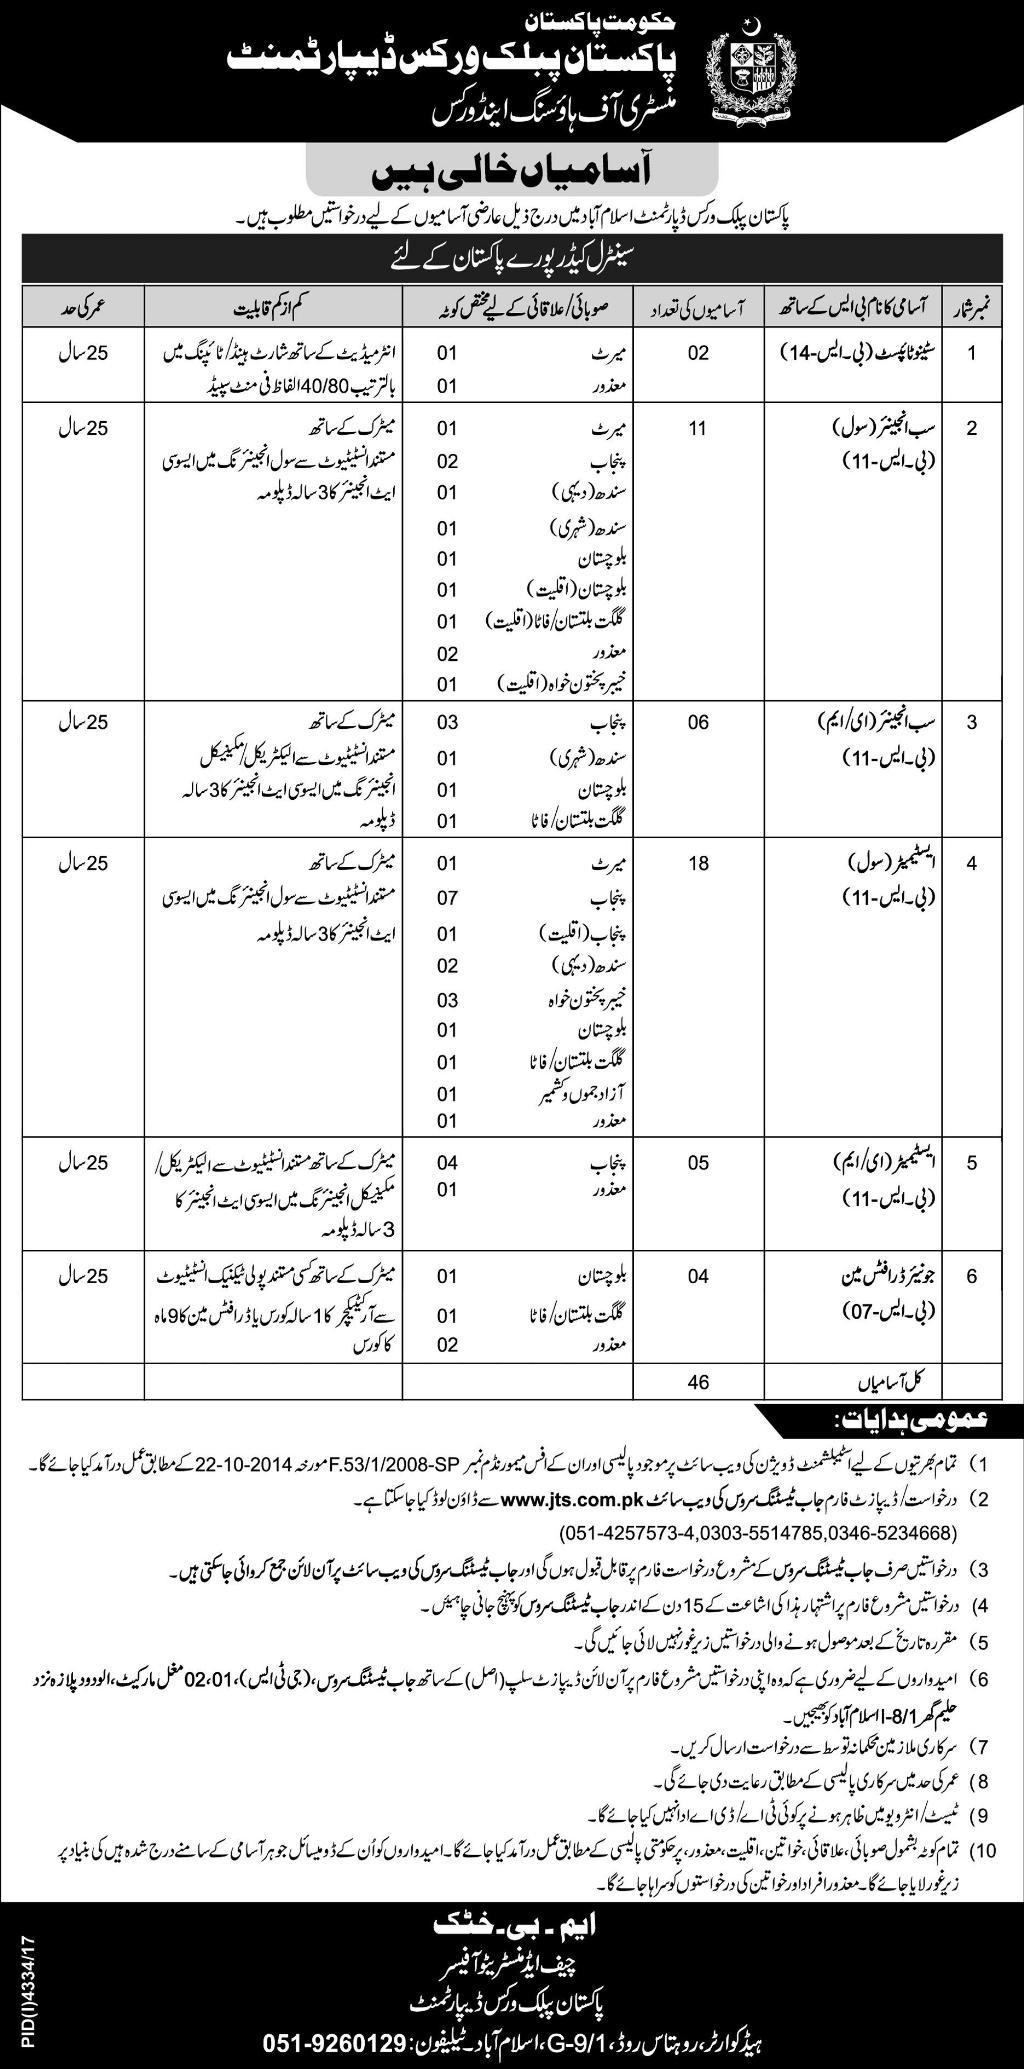 Pakistan Public Works Department PPWD Jobs